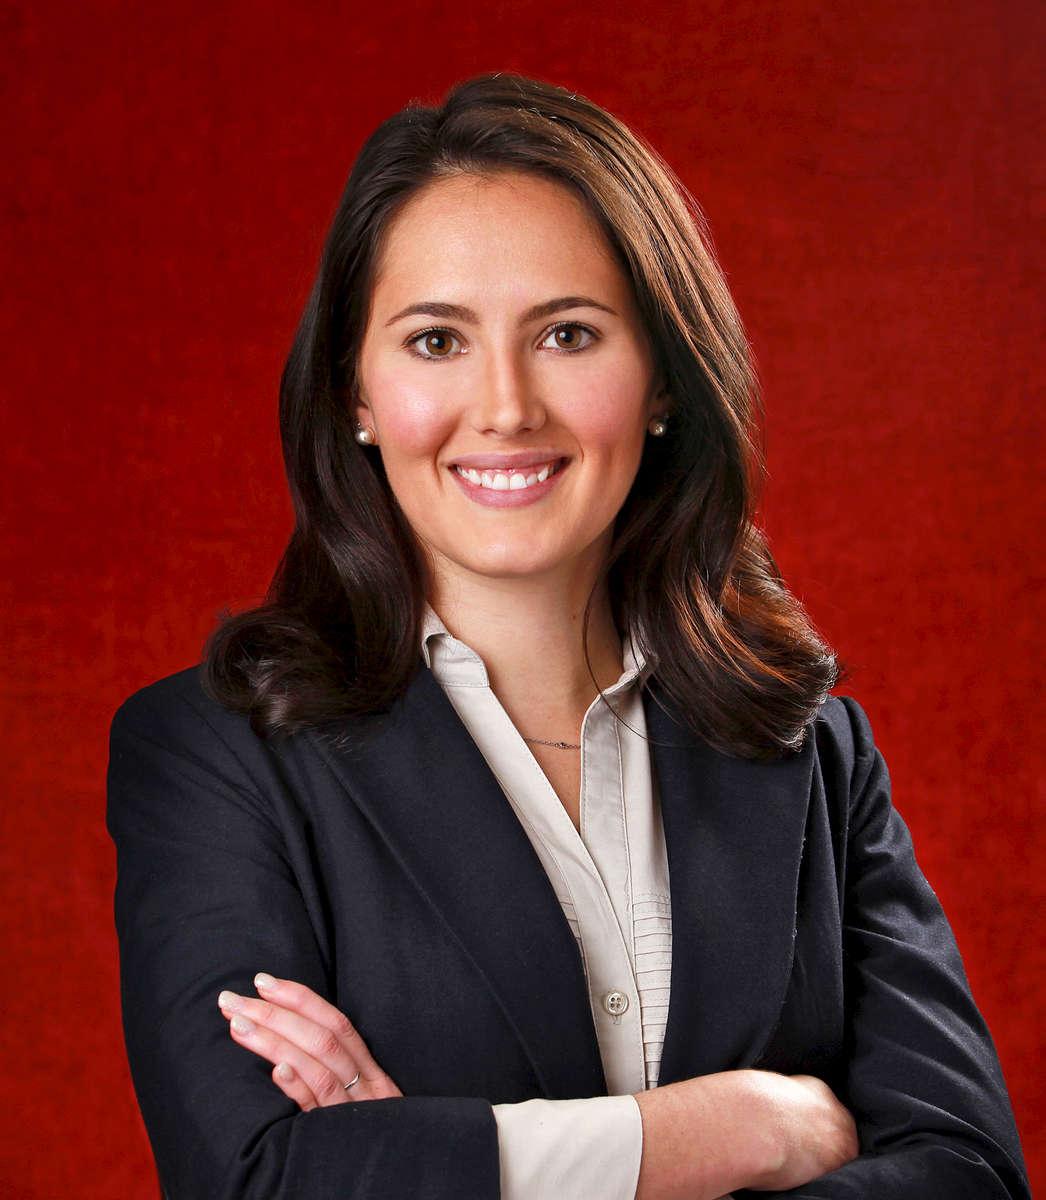 Female Executive Portraits, Business Head Shots for Women